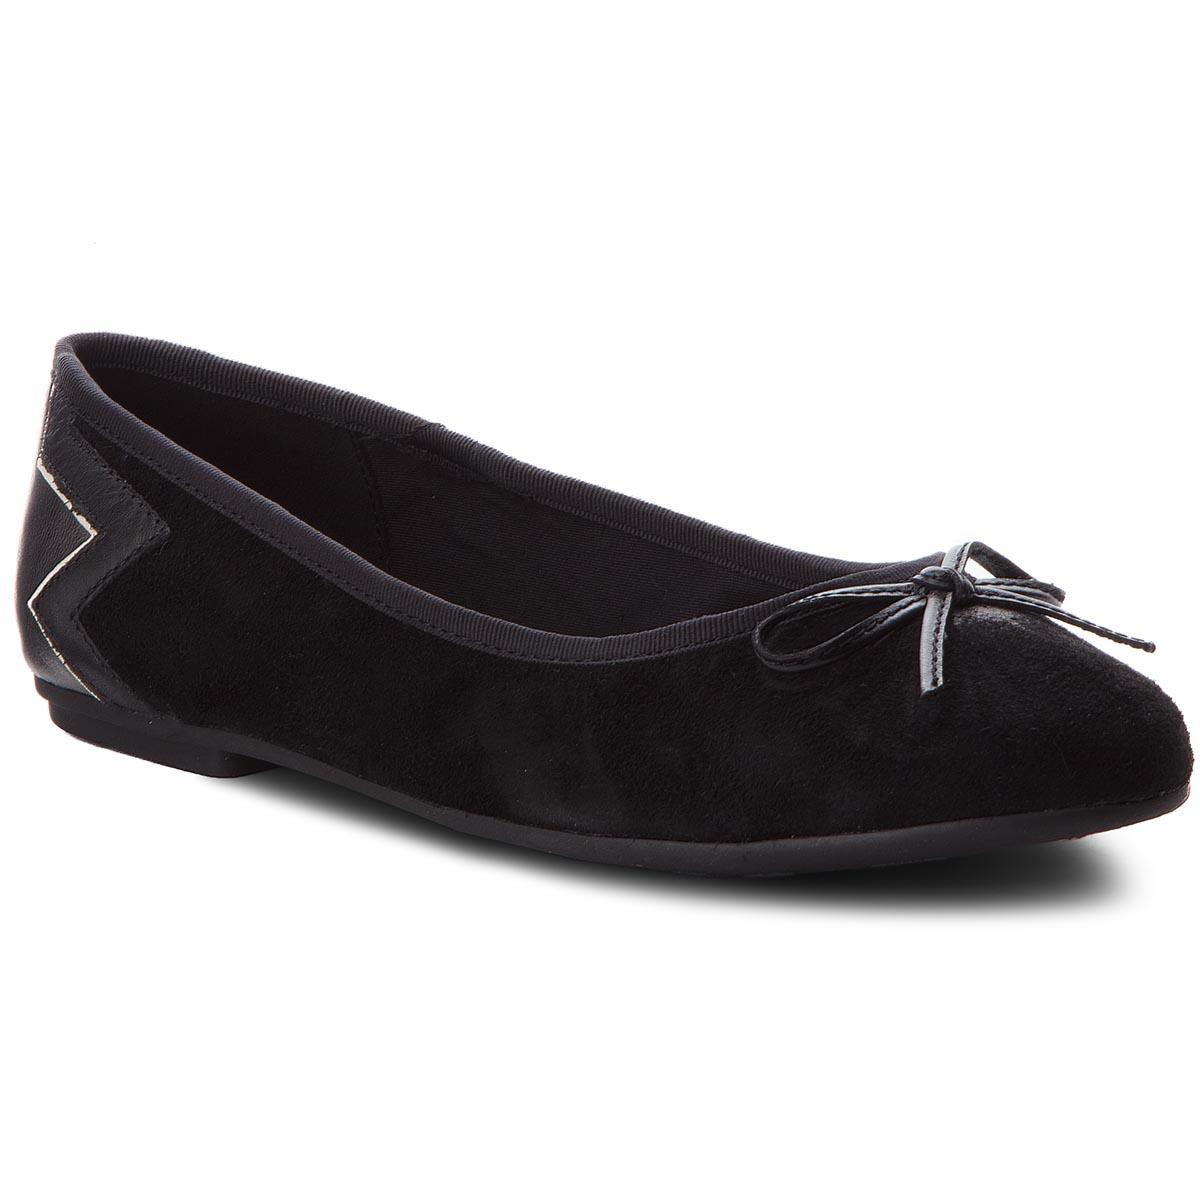 0c7853221fe Baleríny TOMMY HILFIGER - Elevated Suede Ballerina FW0FW03036 Black 990. 1